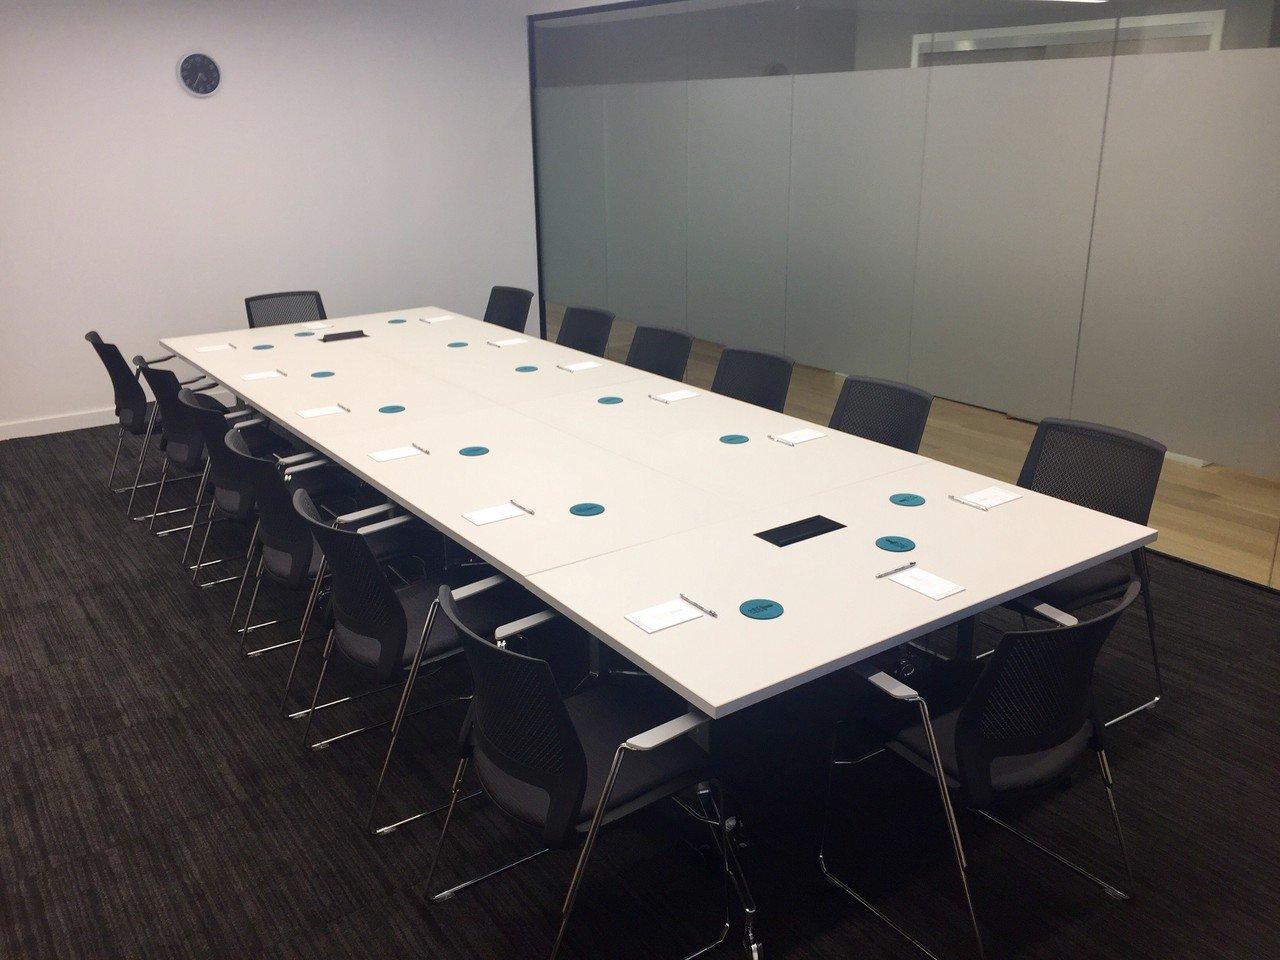 NYC  Salle de réunion 110west40 Conference Room B image 2